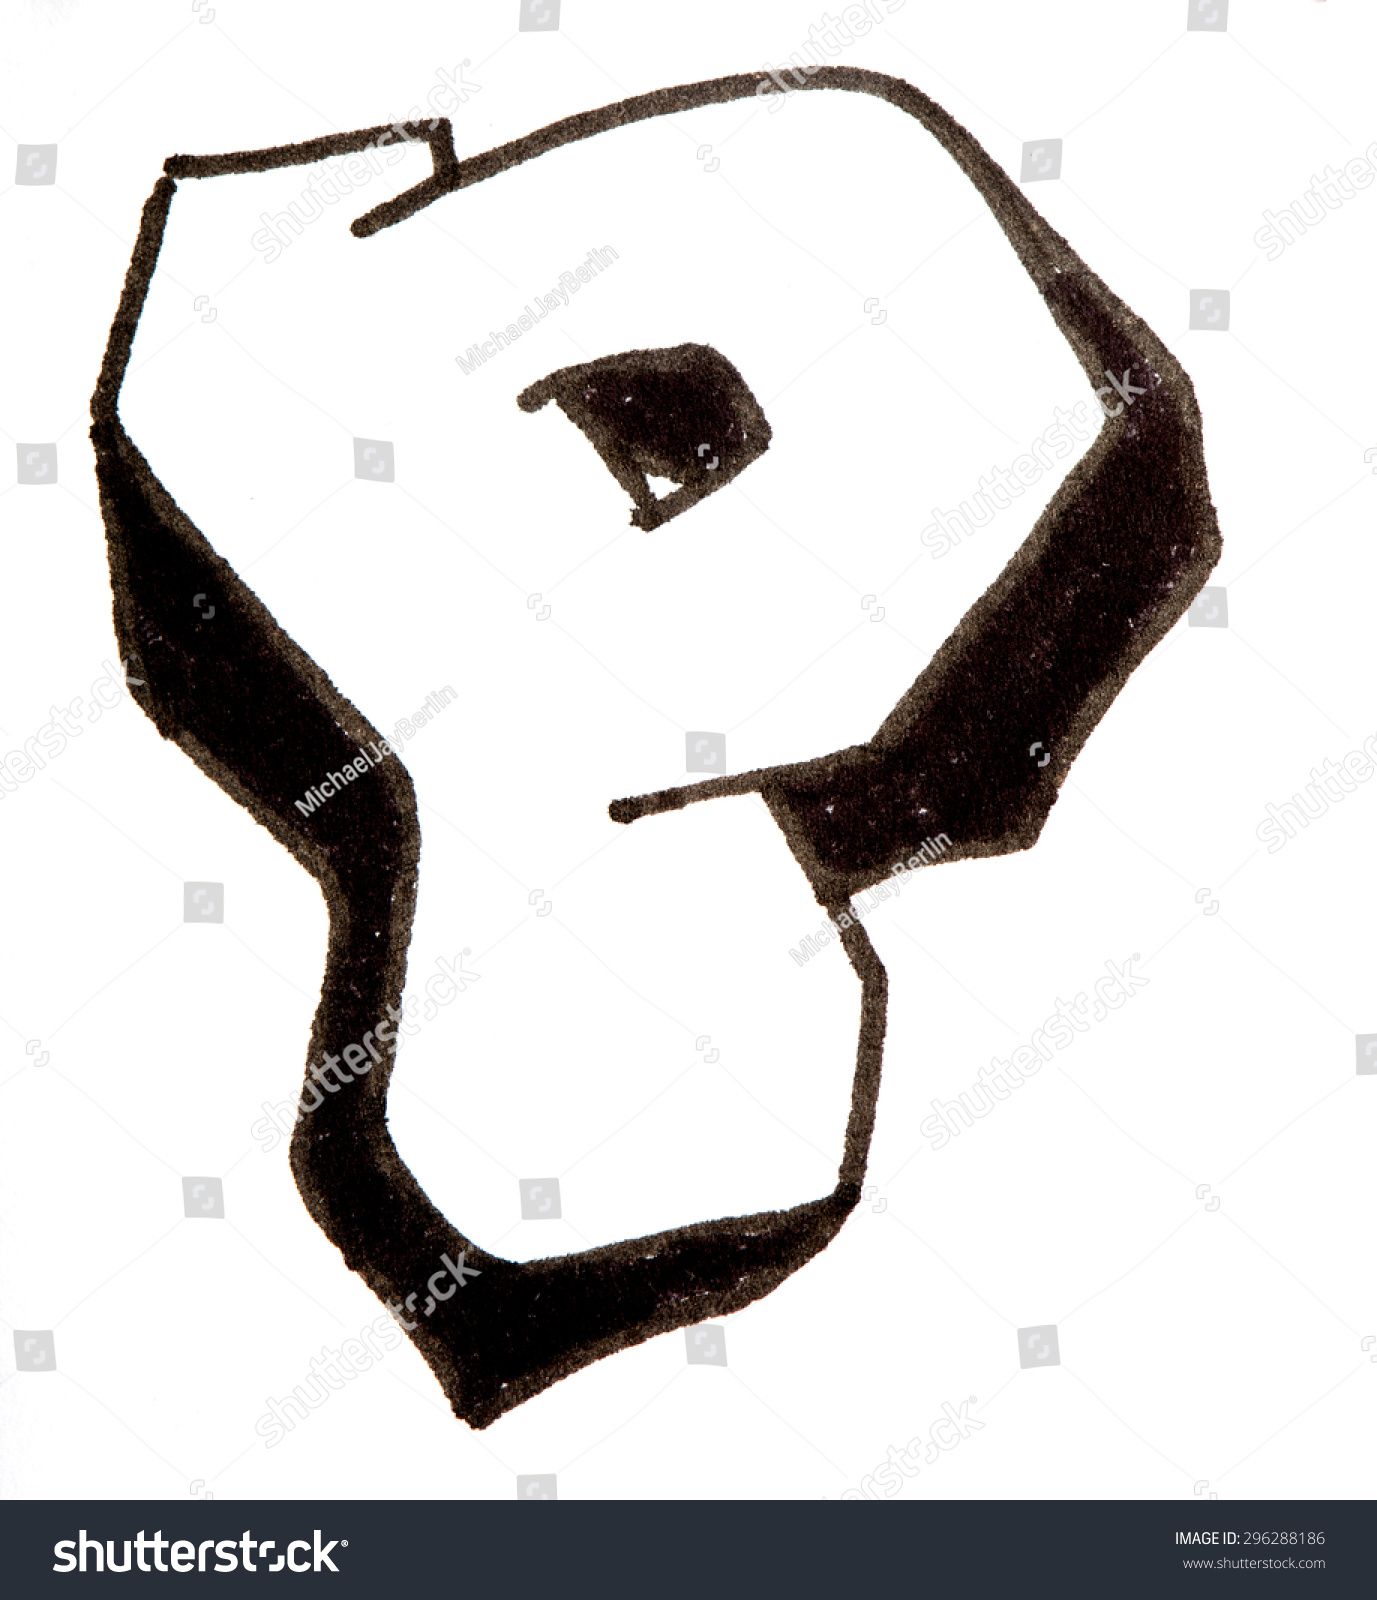 Letter P Hand Drawn Alphabet Graffiti Stockillustration 296288186